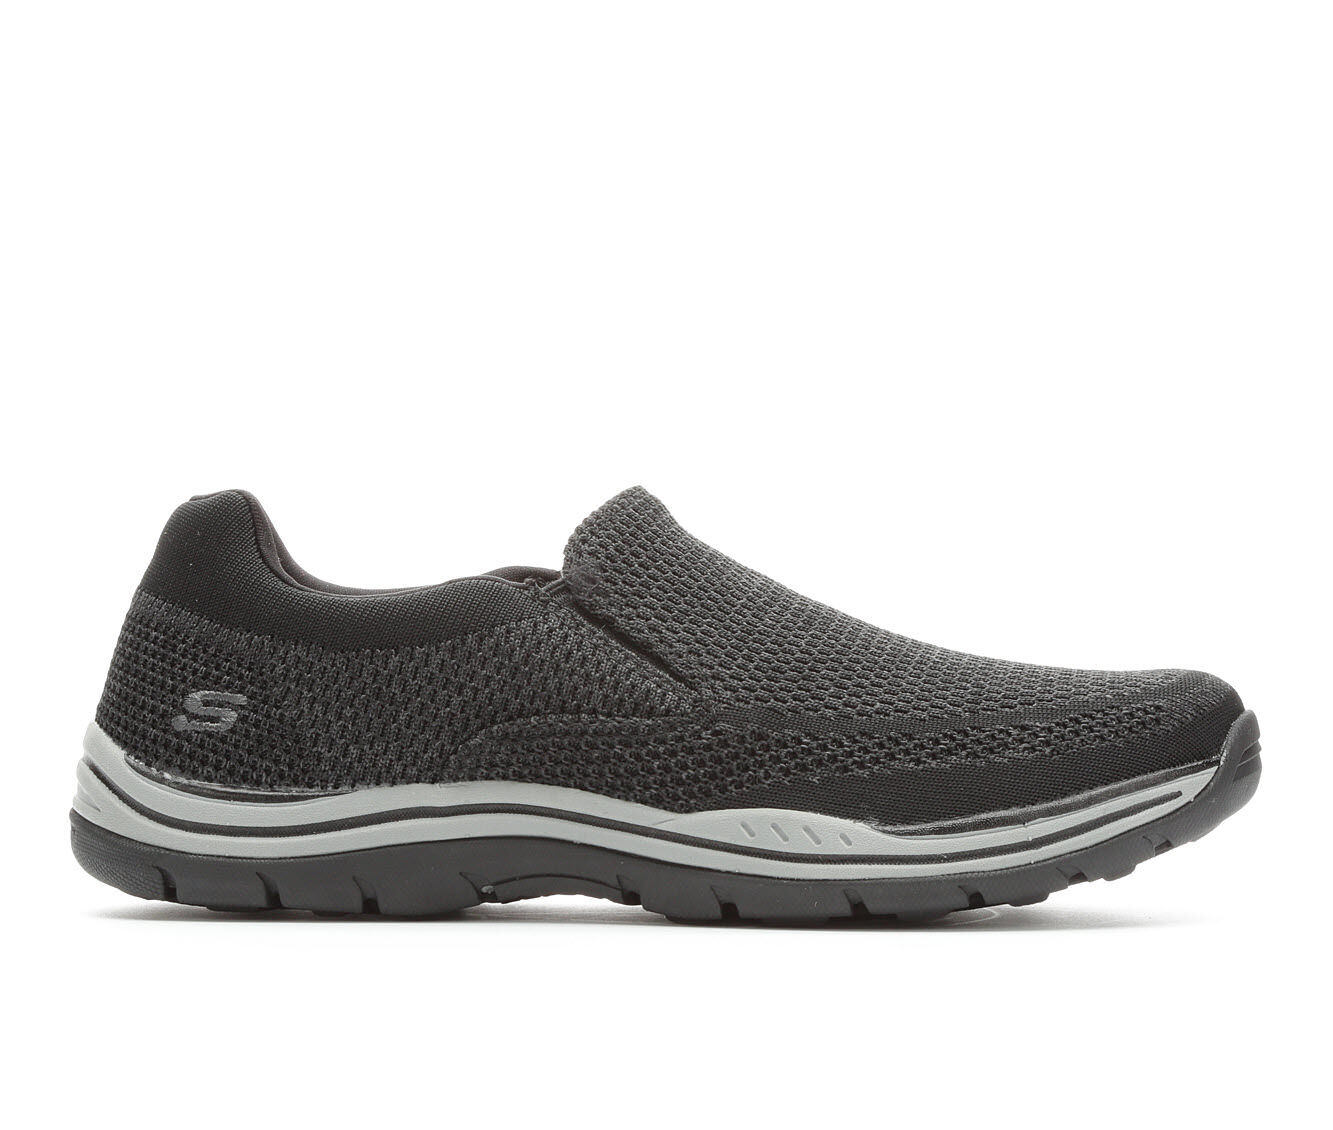 Men's Skechers Gomel 65086 Casual Shoes Black